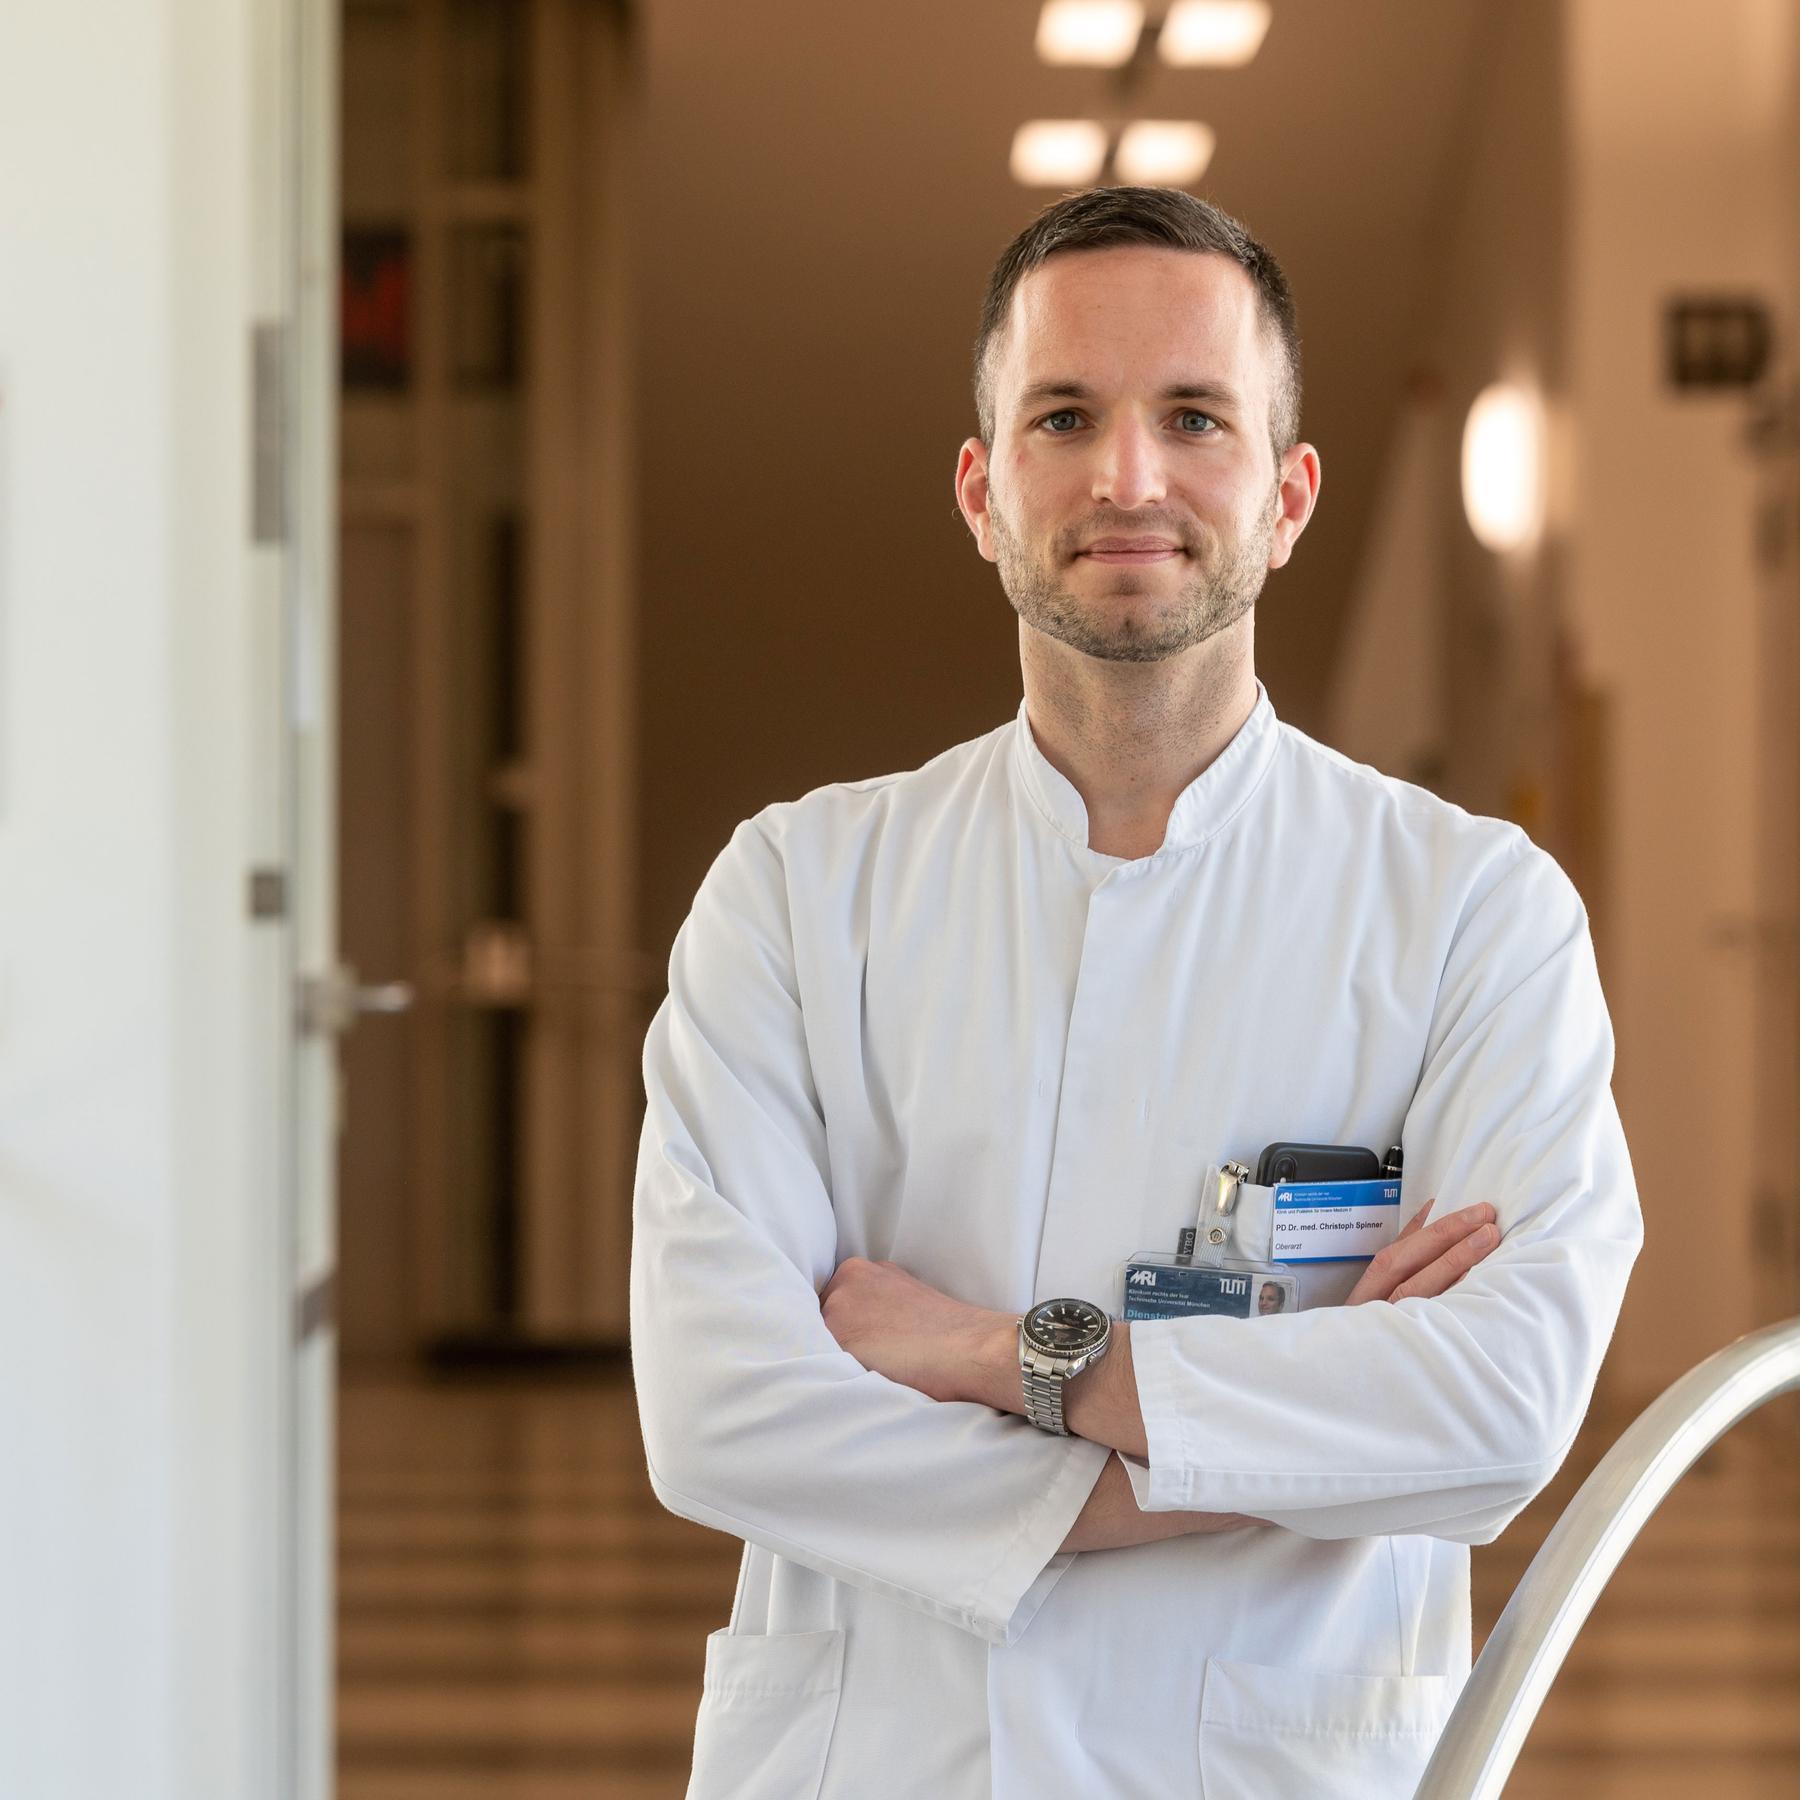 Corona-News mit Dr. Christoph Spinner (17.08.2021)